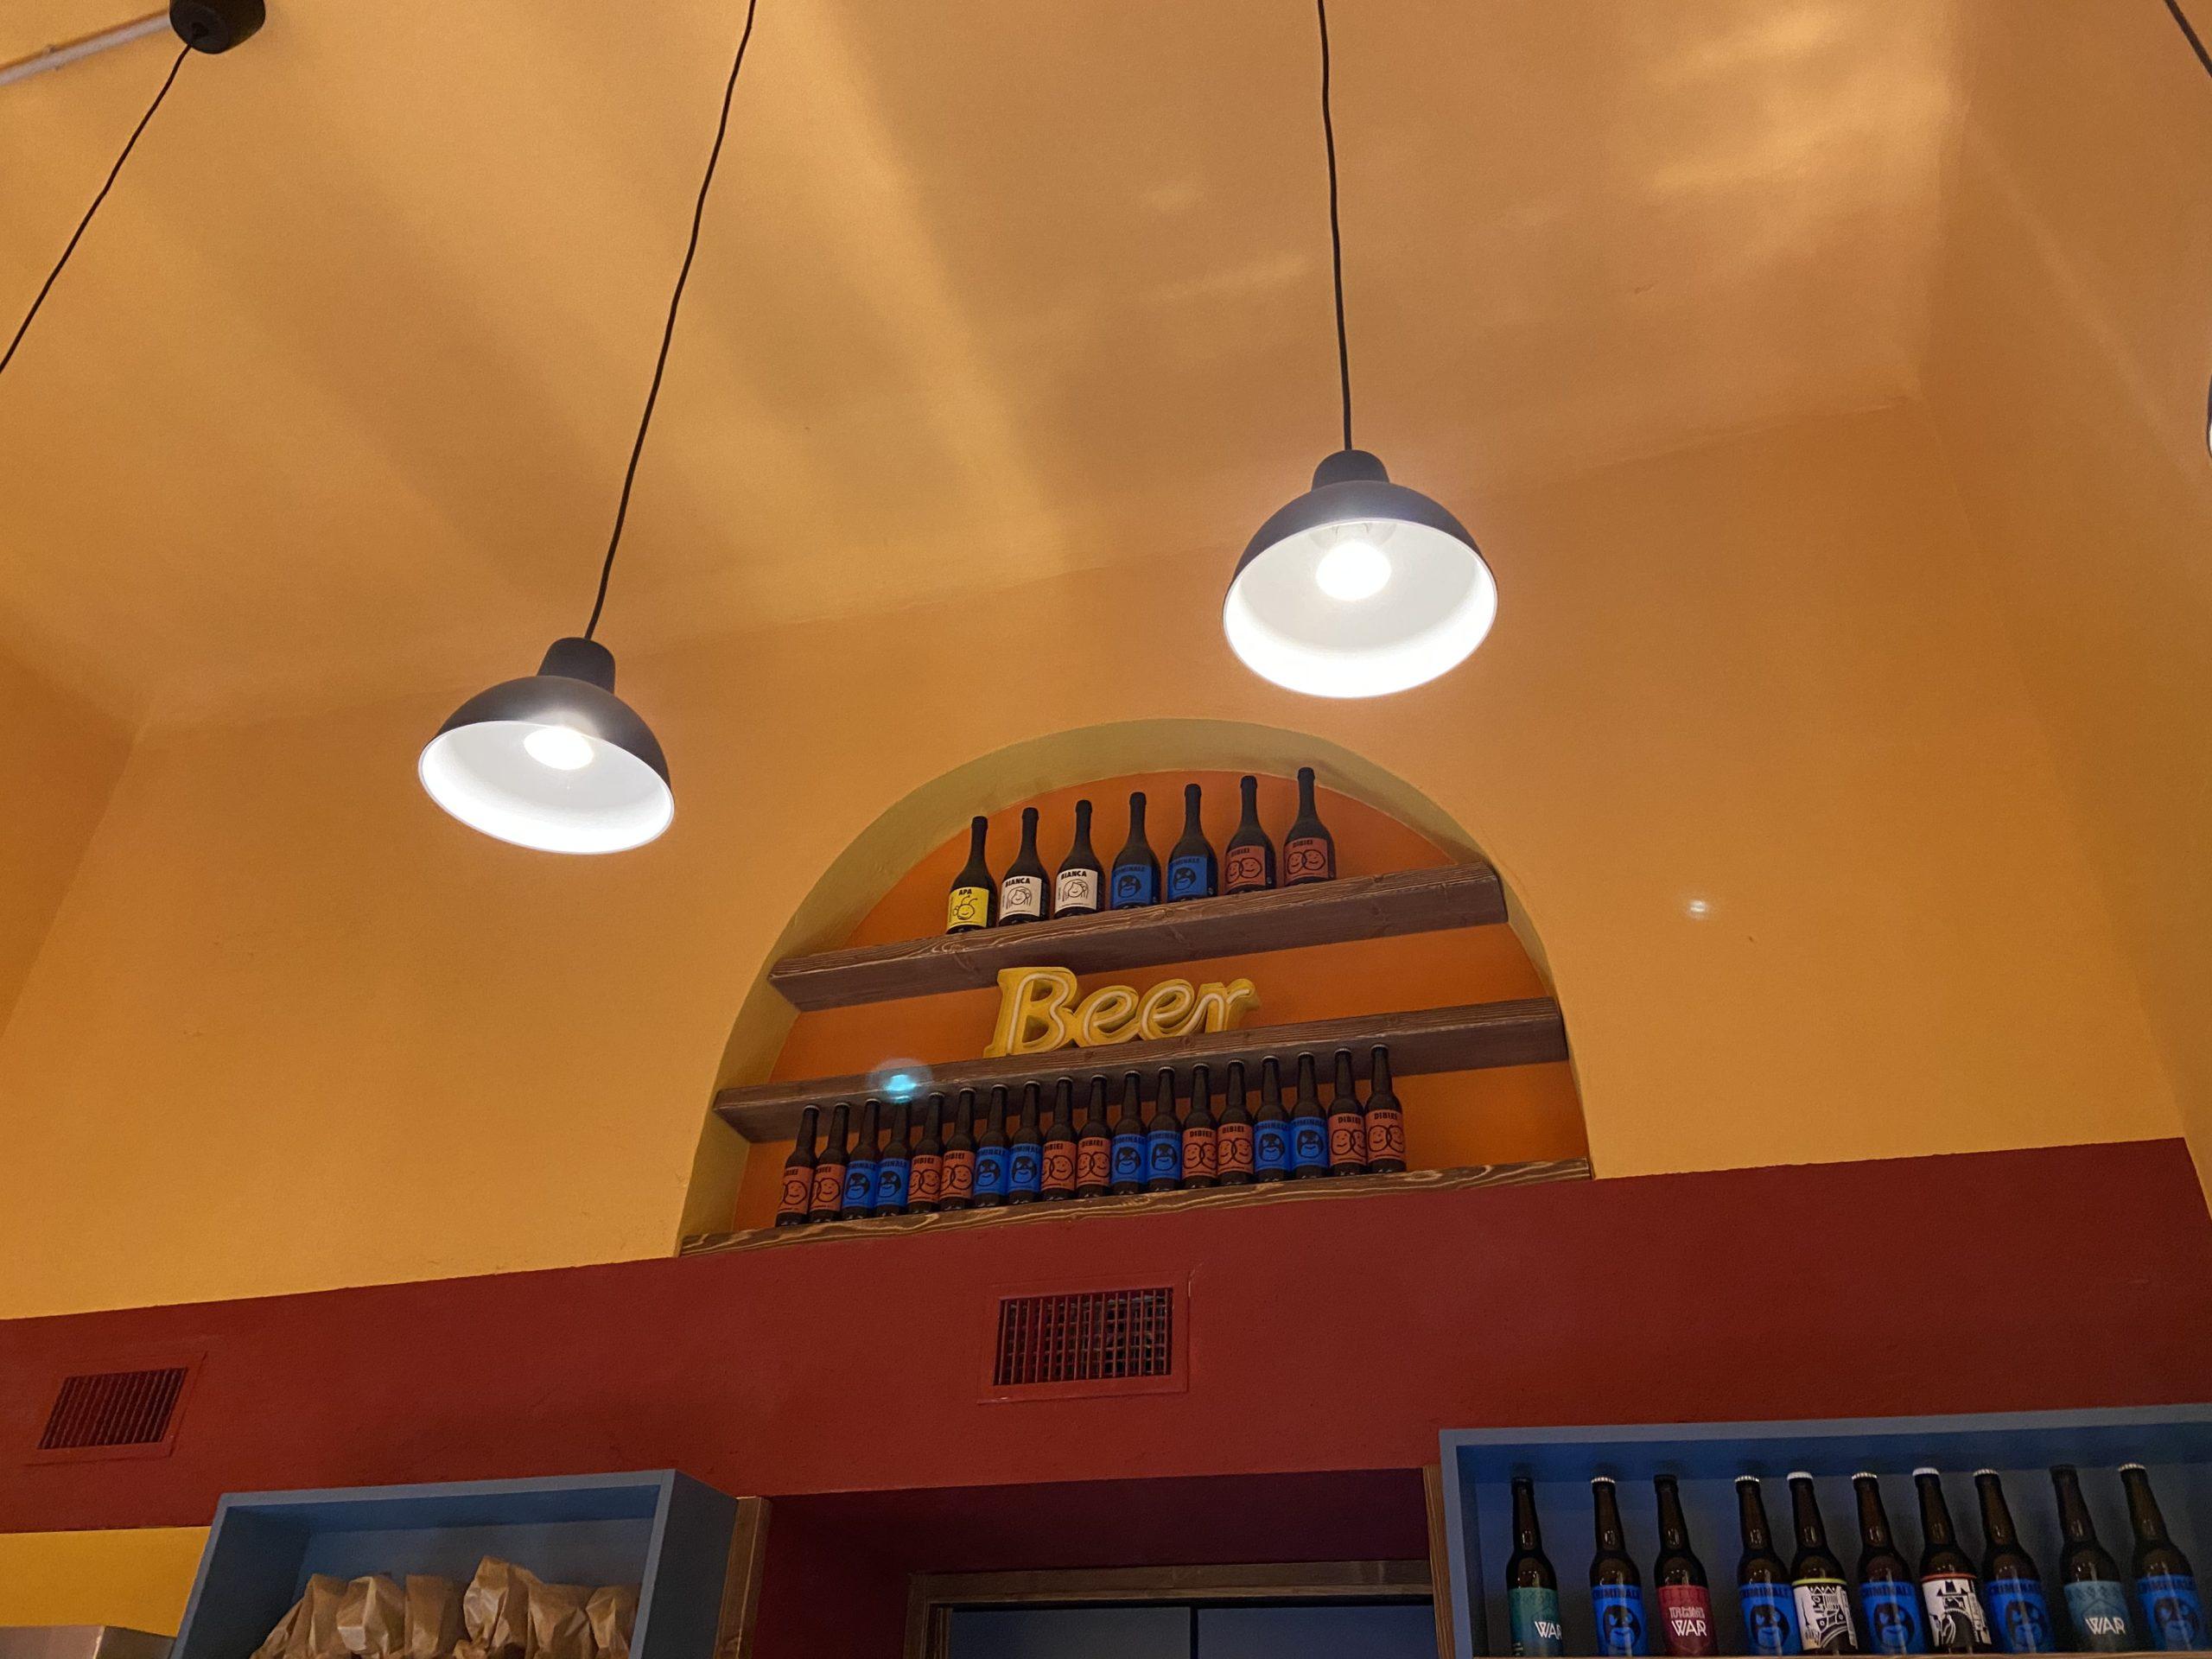 Tigelle e Birra Artigianale: la beer firm Esubeerante apre un locale a Milano!